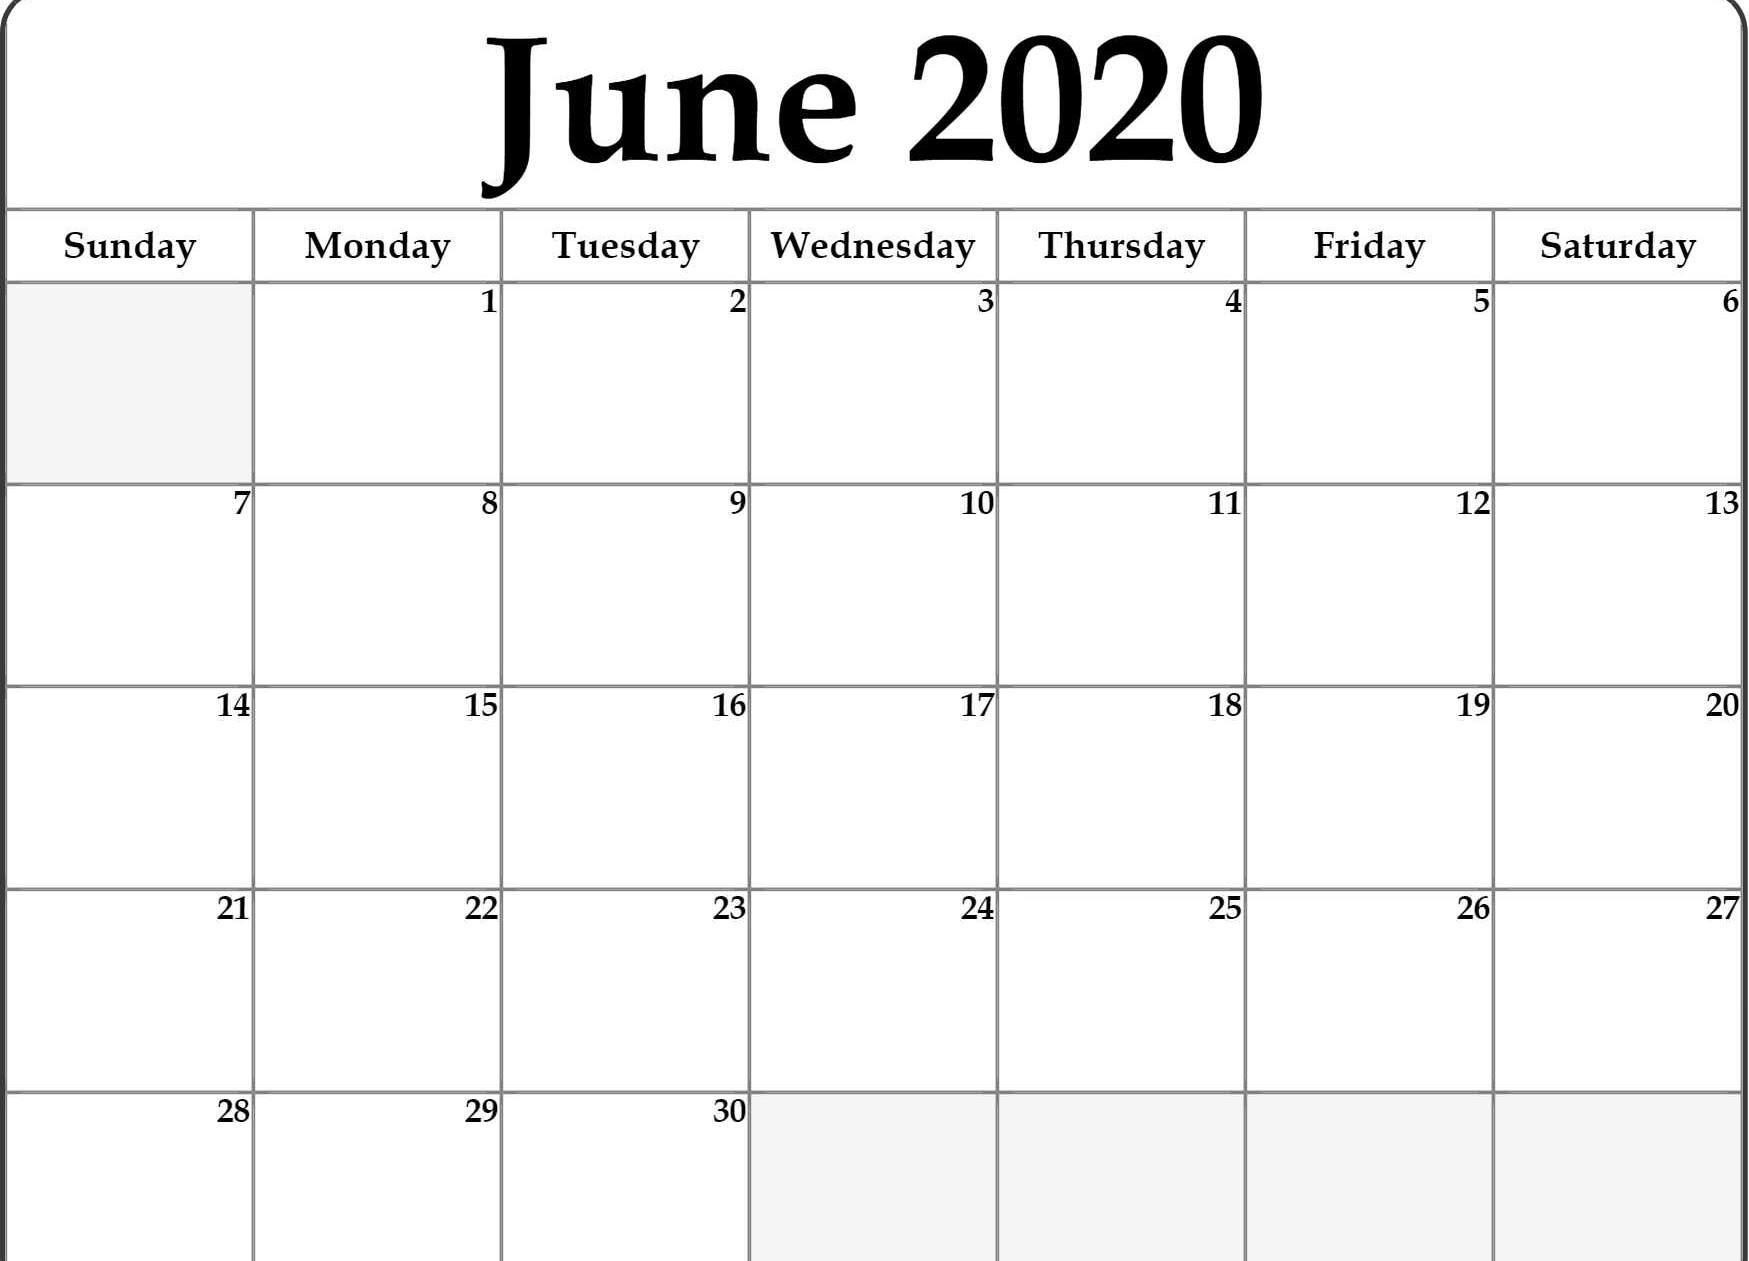 June Calendar 2020 Free Printable Template Pdf Word Excel-Blank Printable Calendar 2020 Monthly